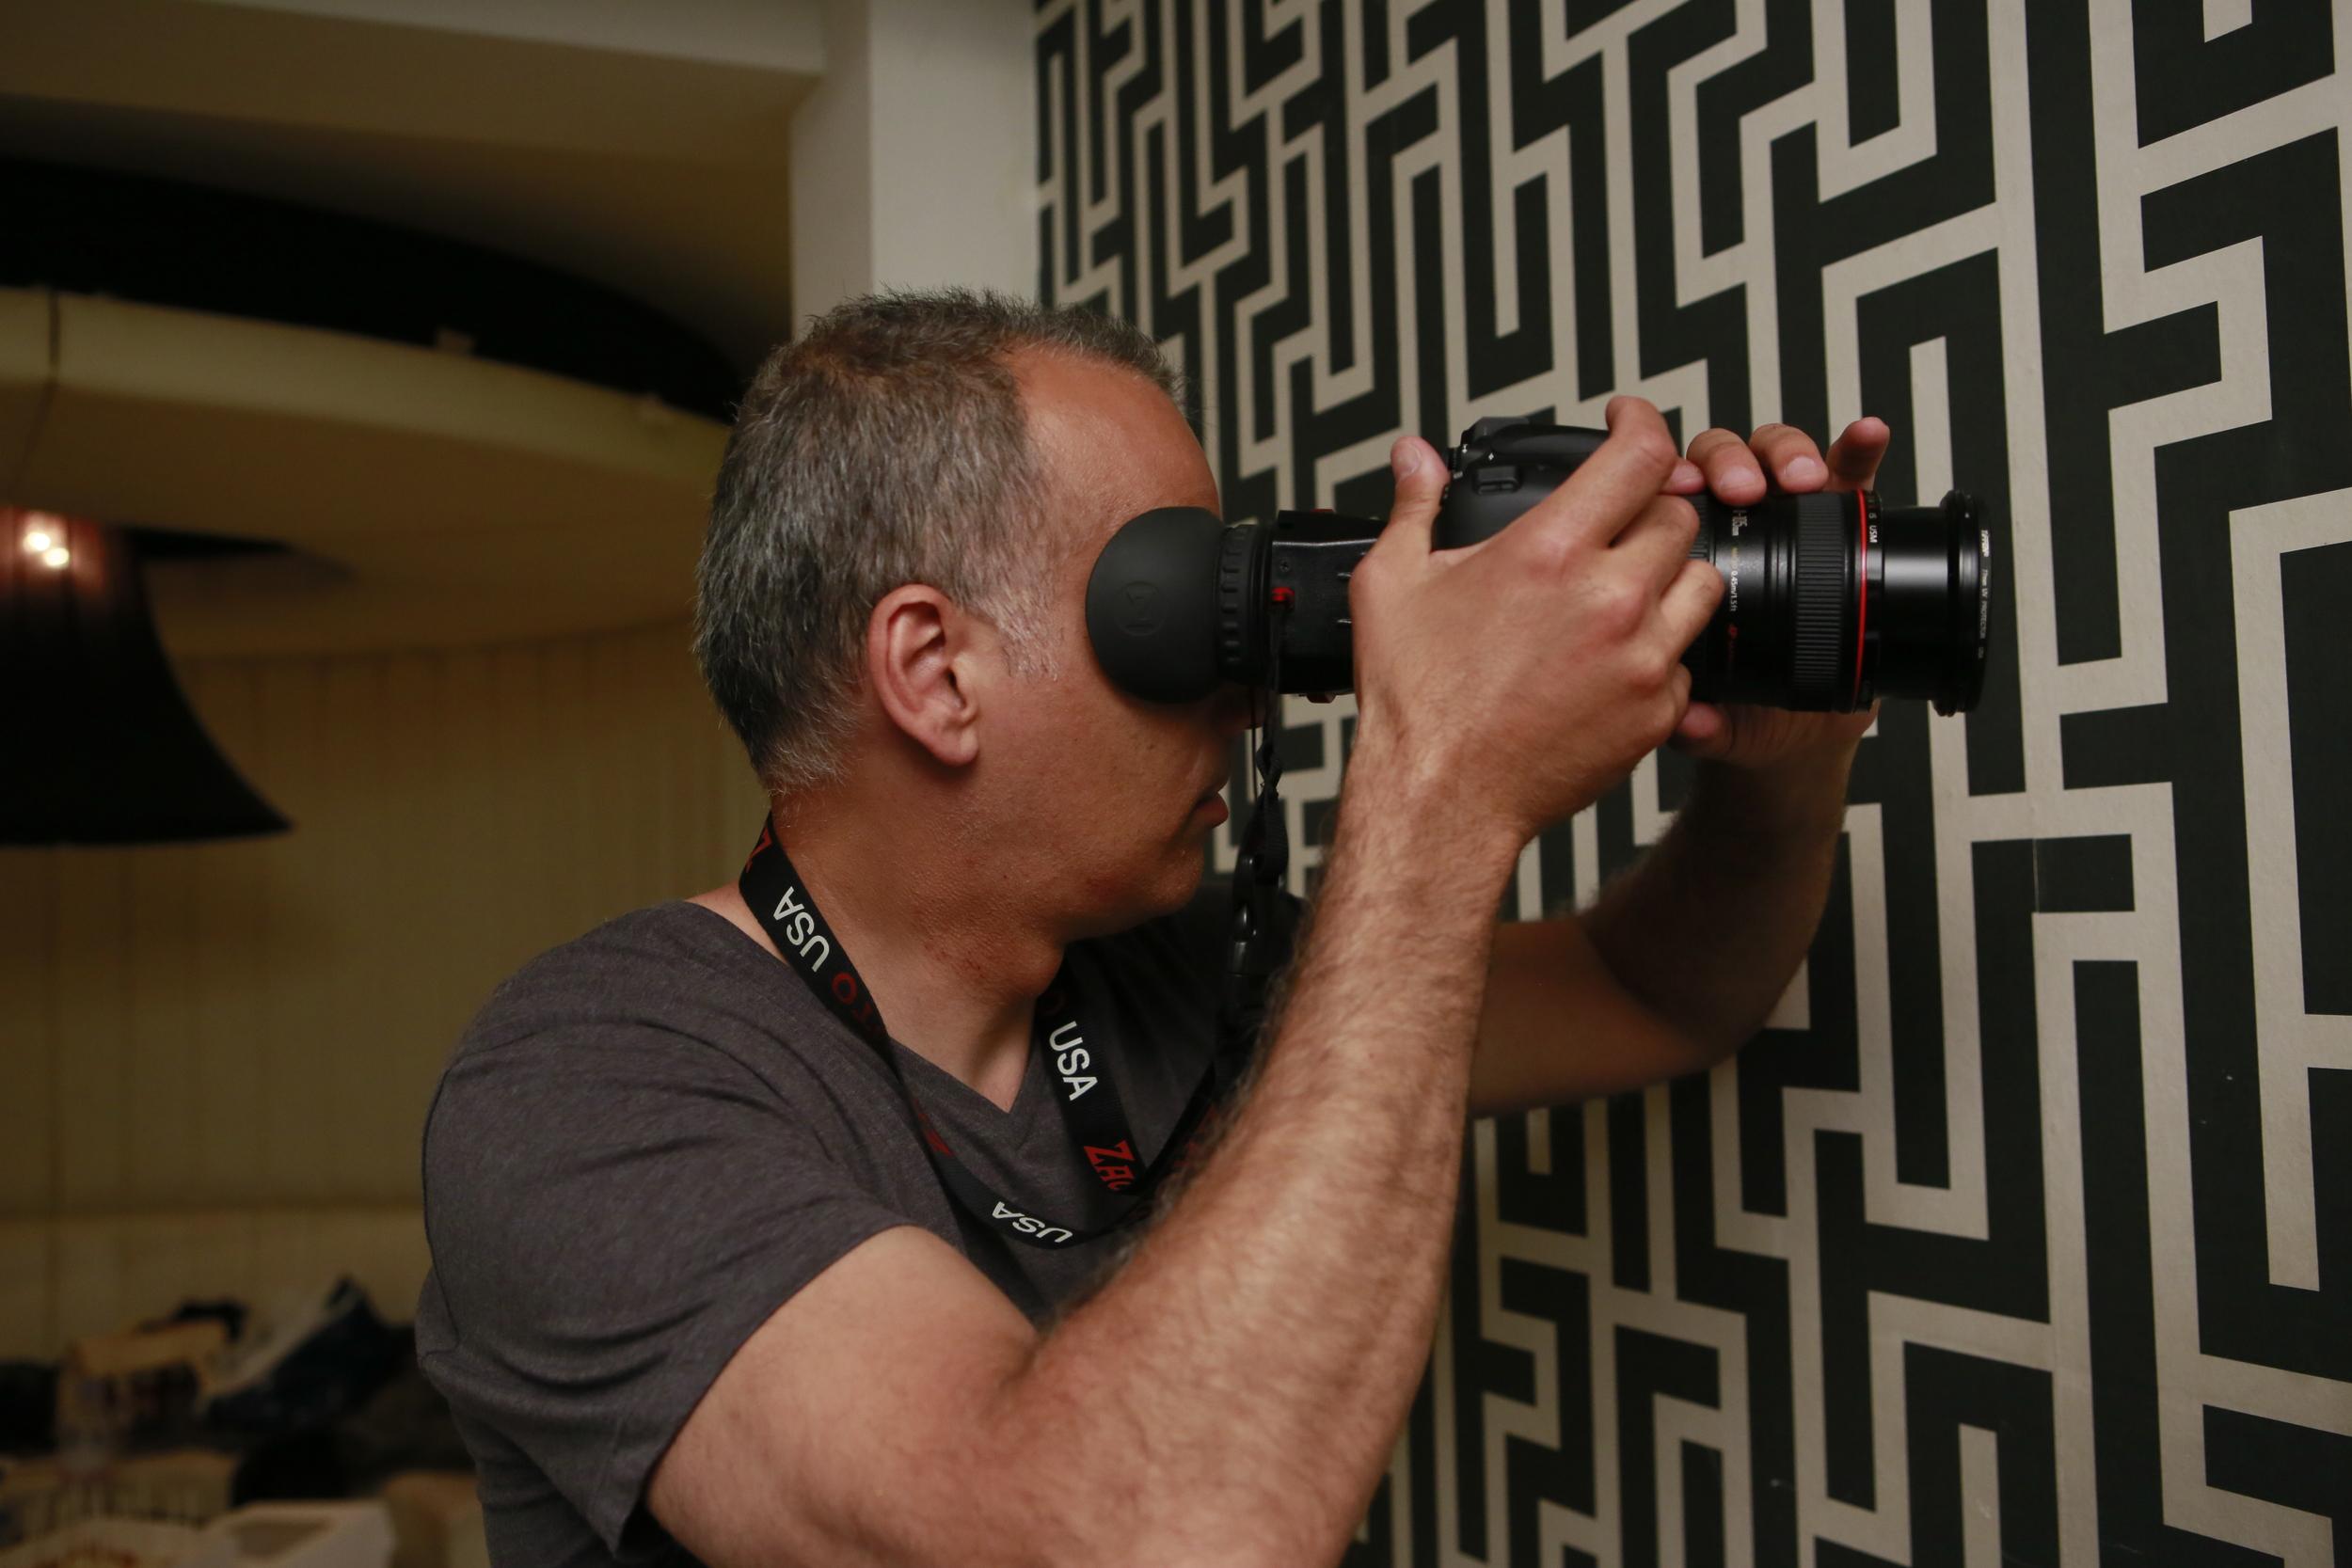 wedding Videographer urban cinematography